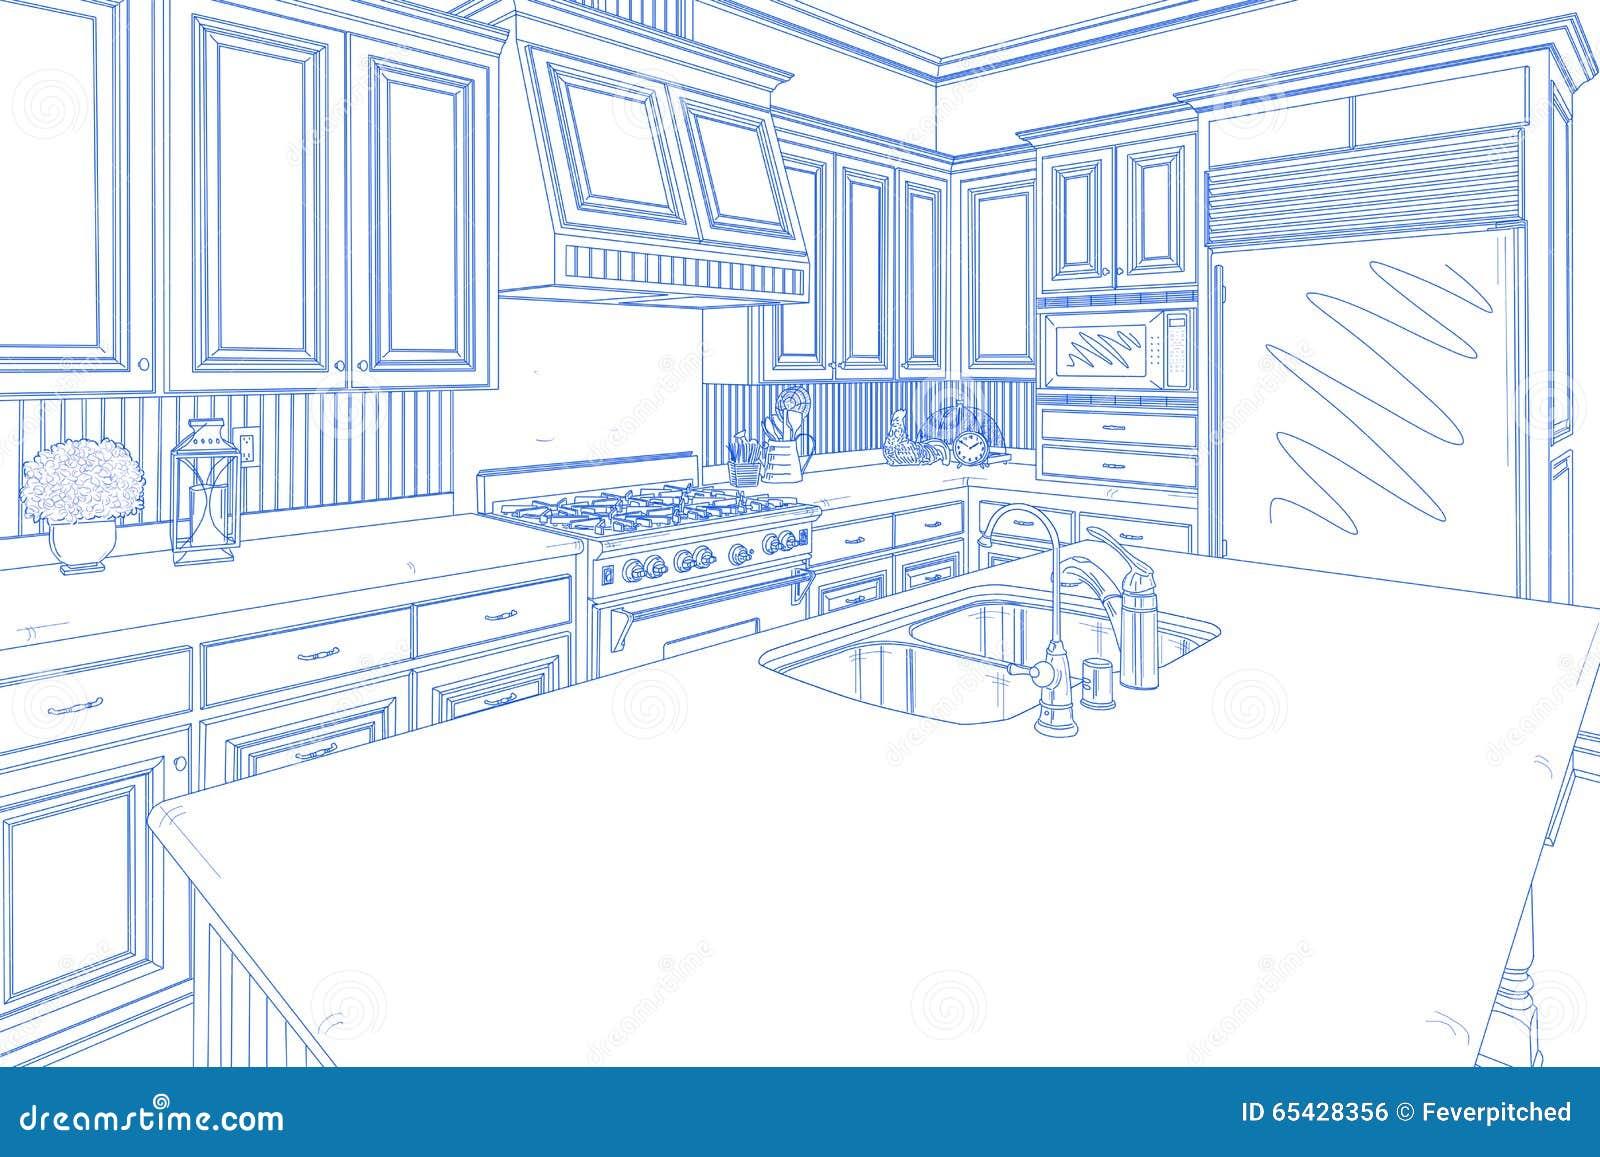 Blue Custom Kitchen Design Drawing on White